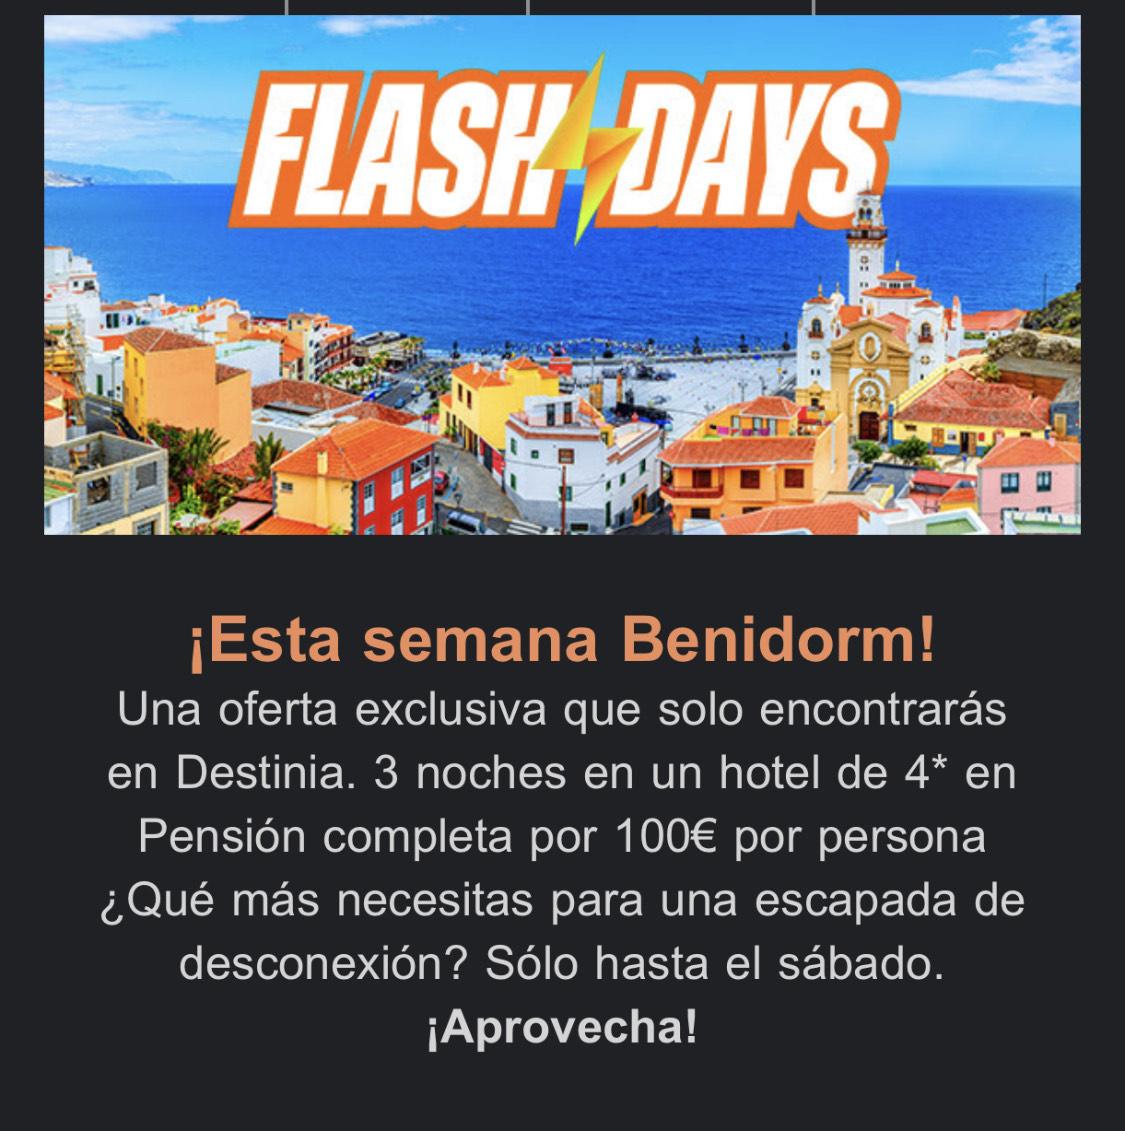 ¡Flash Days de Destinia! Esta semana.... Benidorm